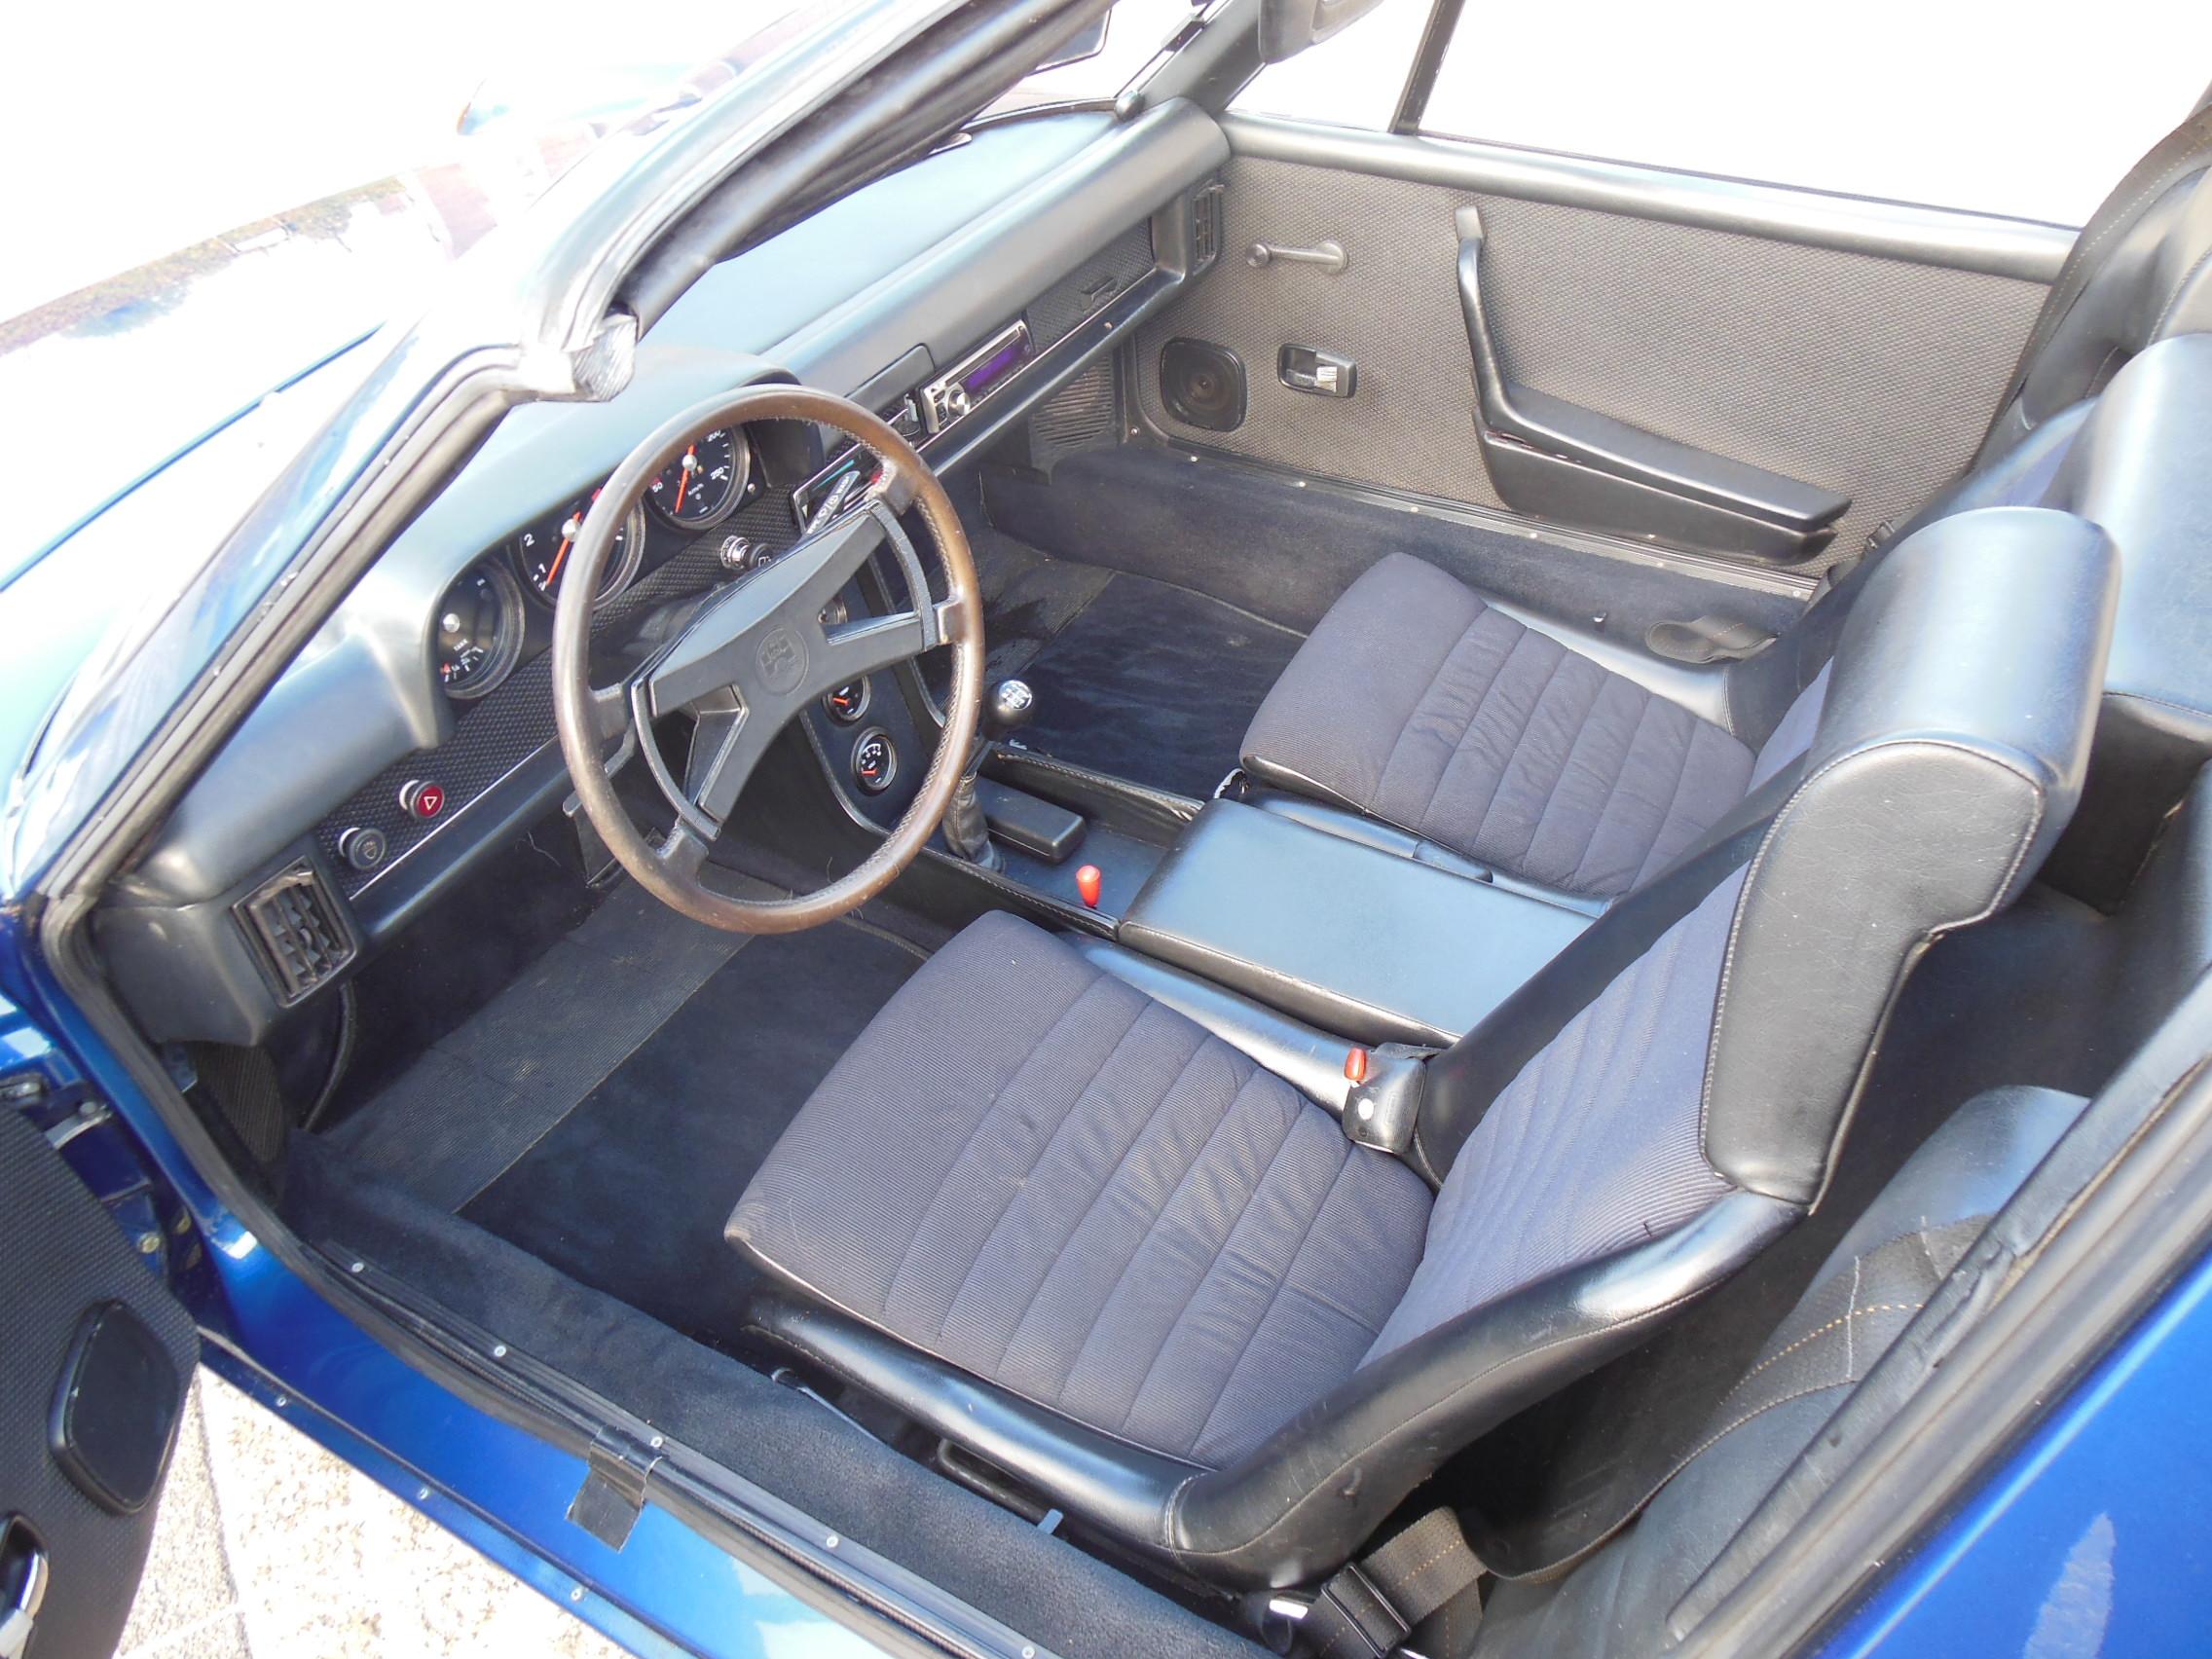 Porsche 914 2.0 1973 Motor defect